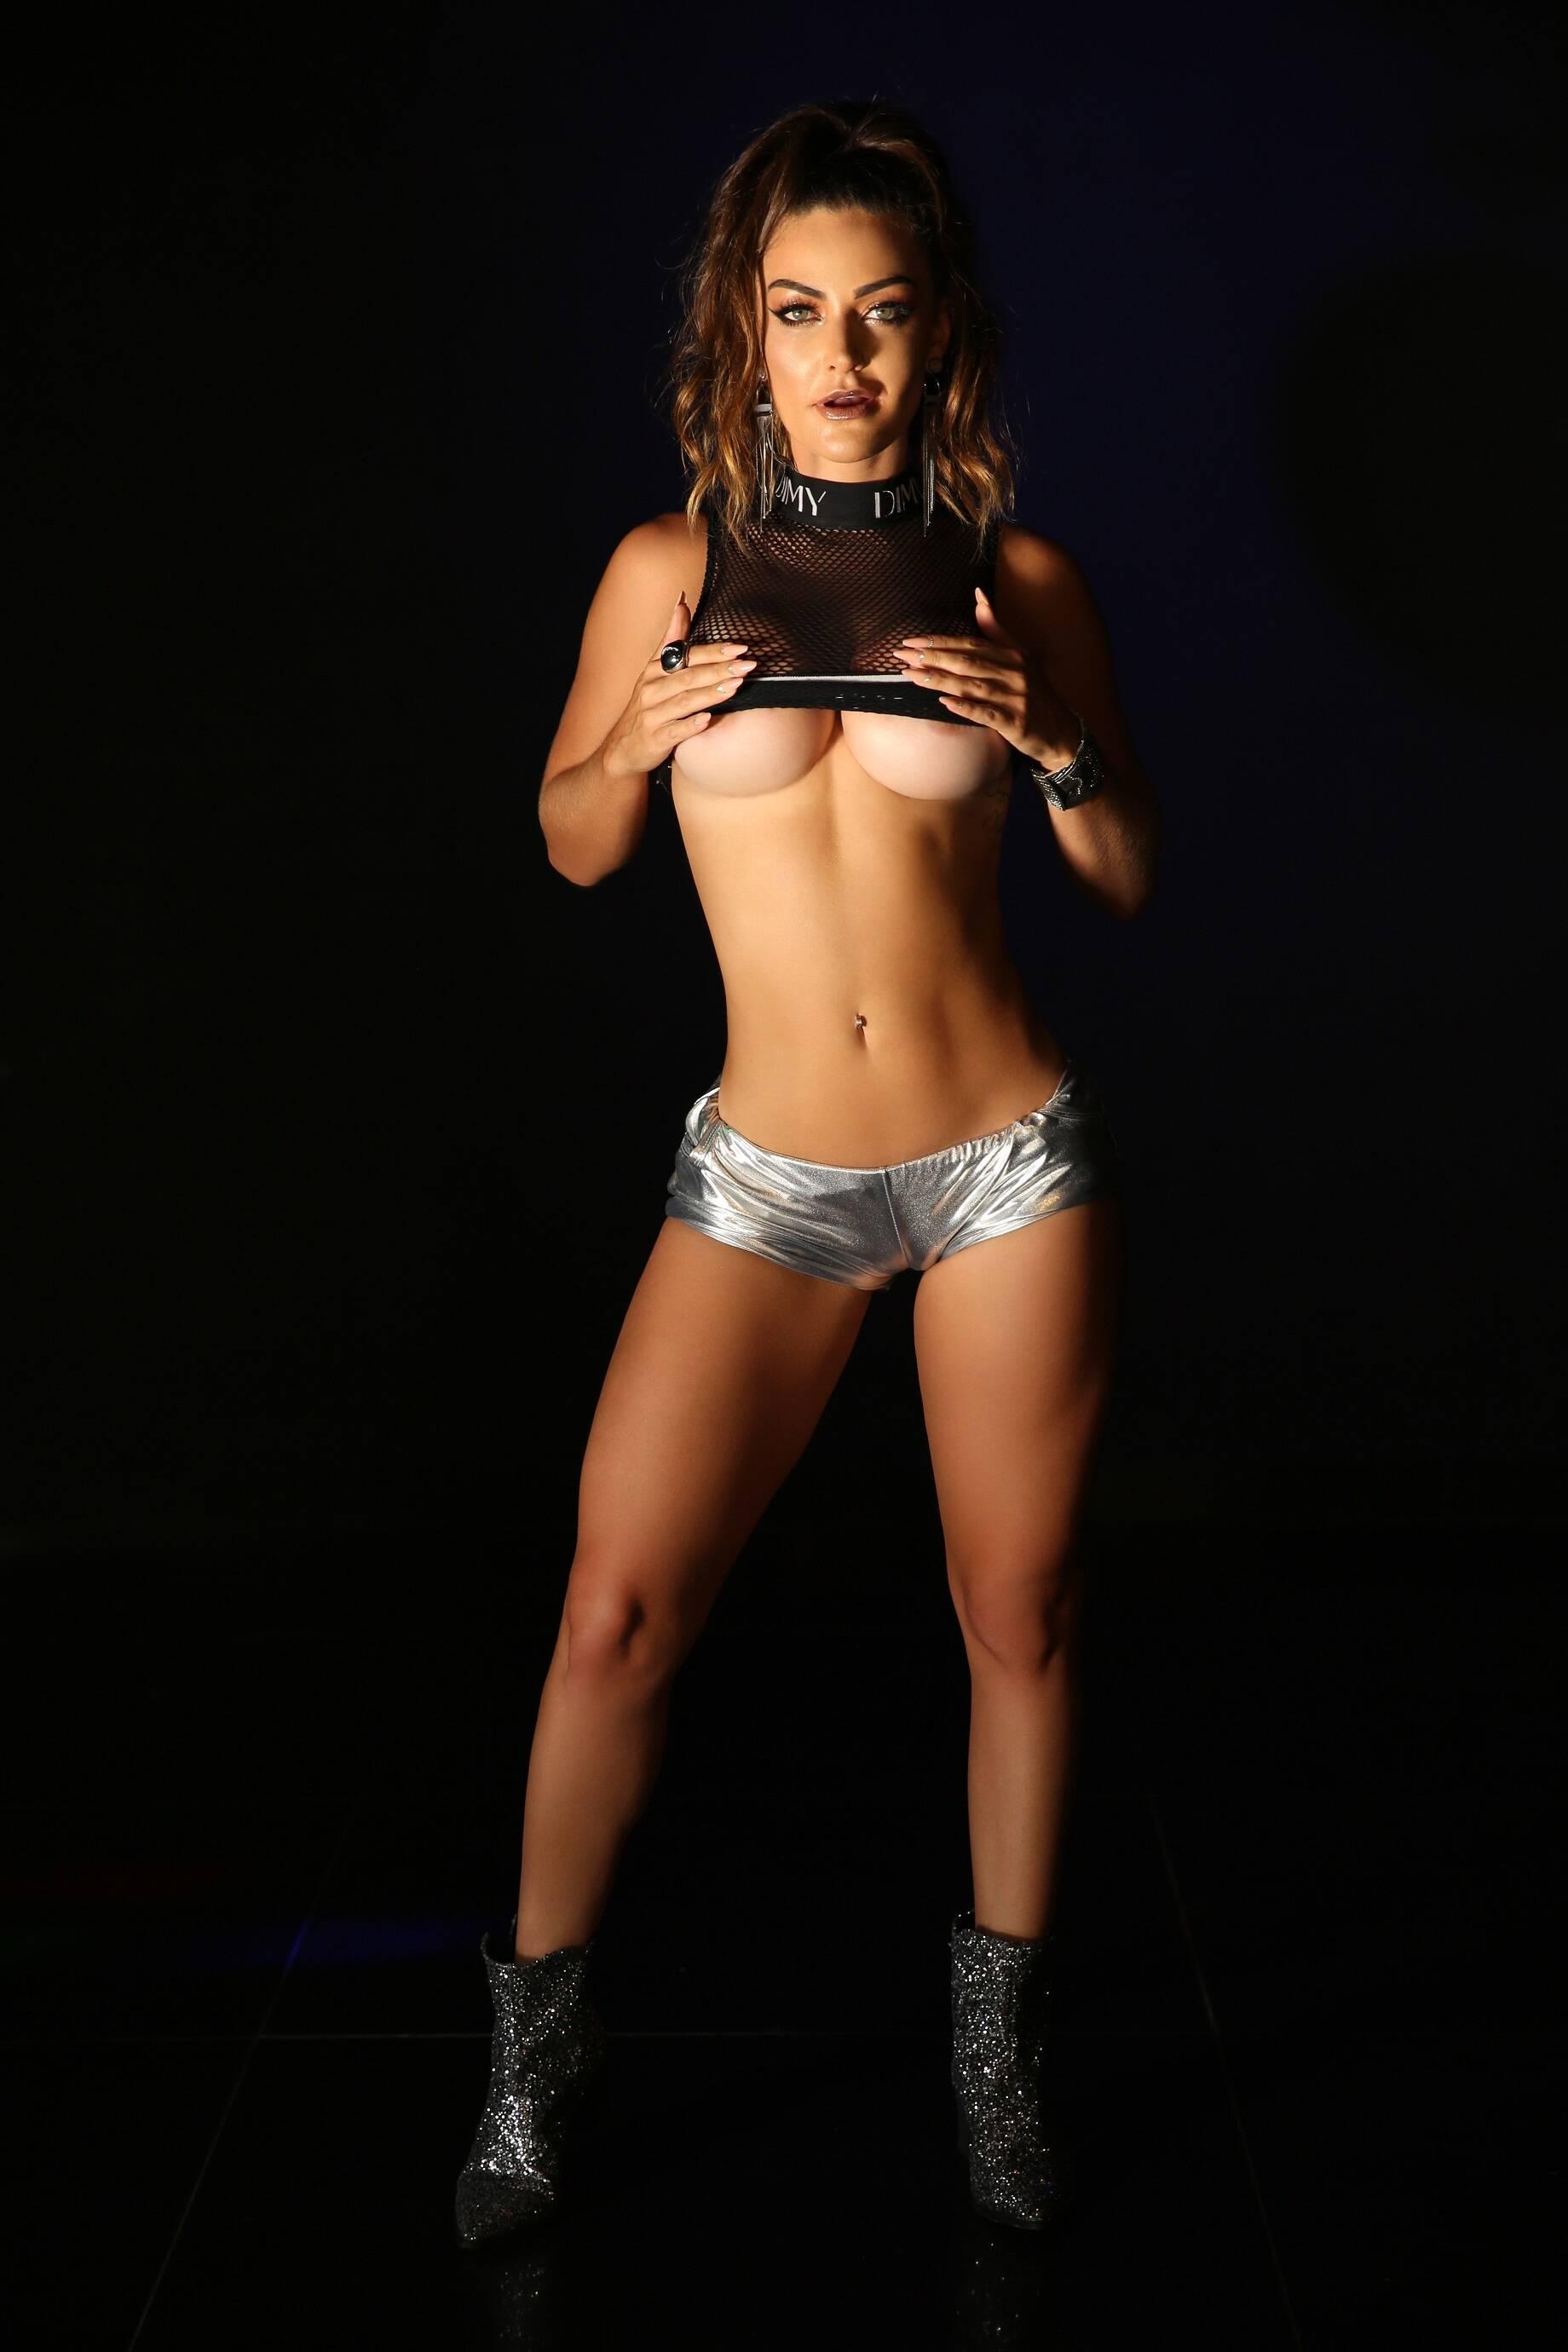 Laura Keller em ensaio sensual para o Diamond Brazil. Foto: Davi Borges/ Diamond Brazil